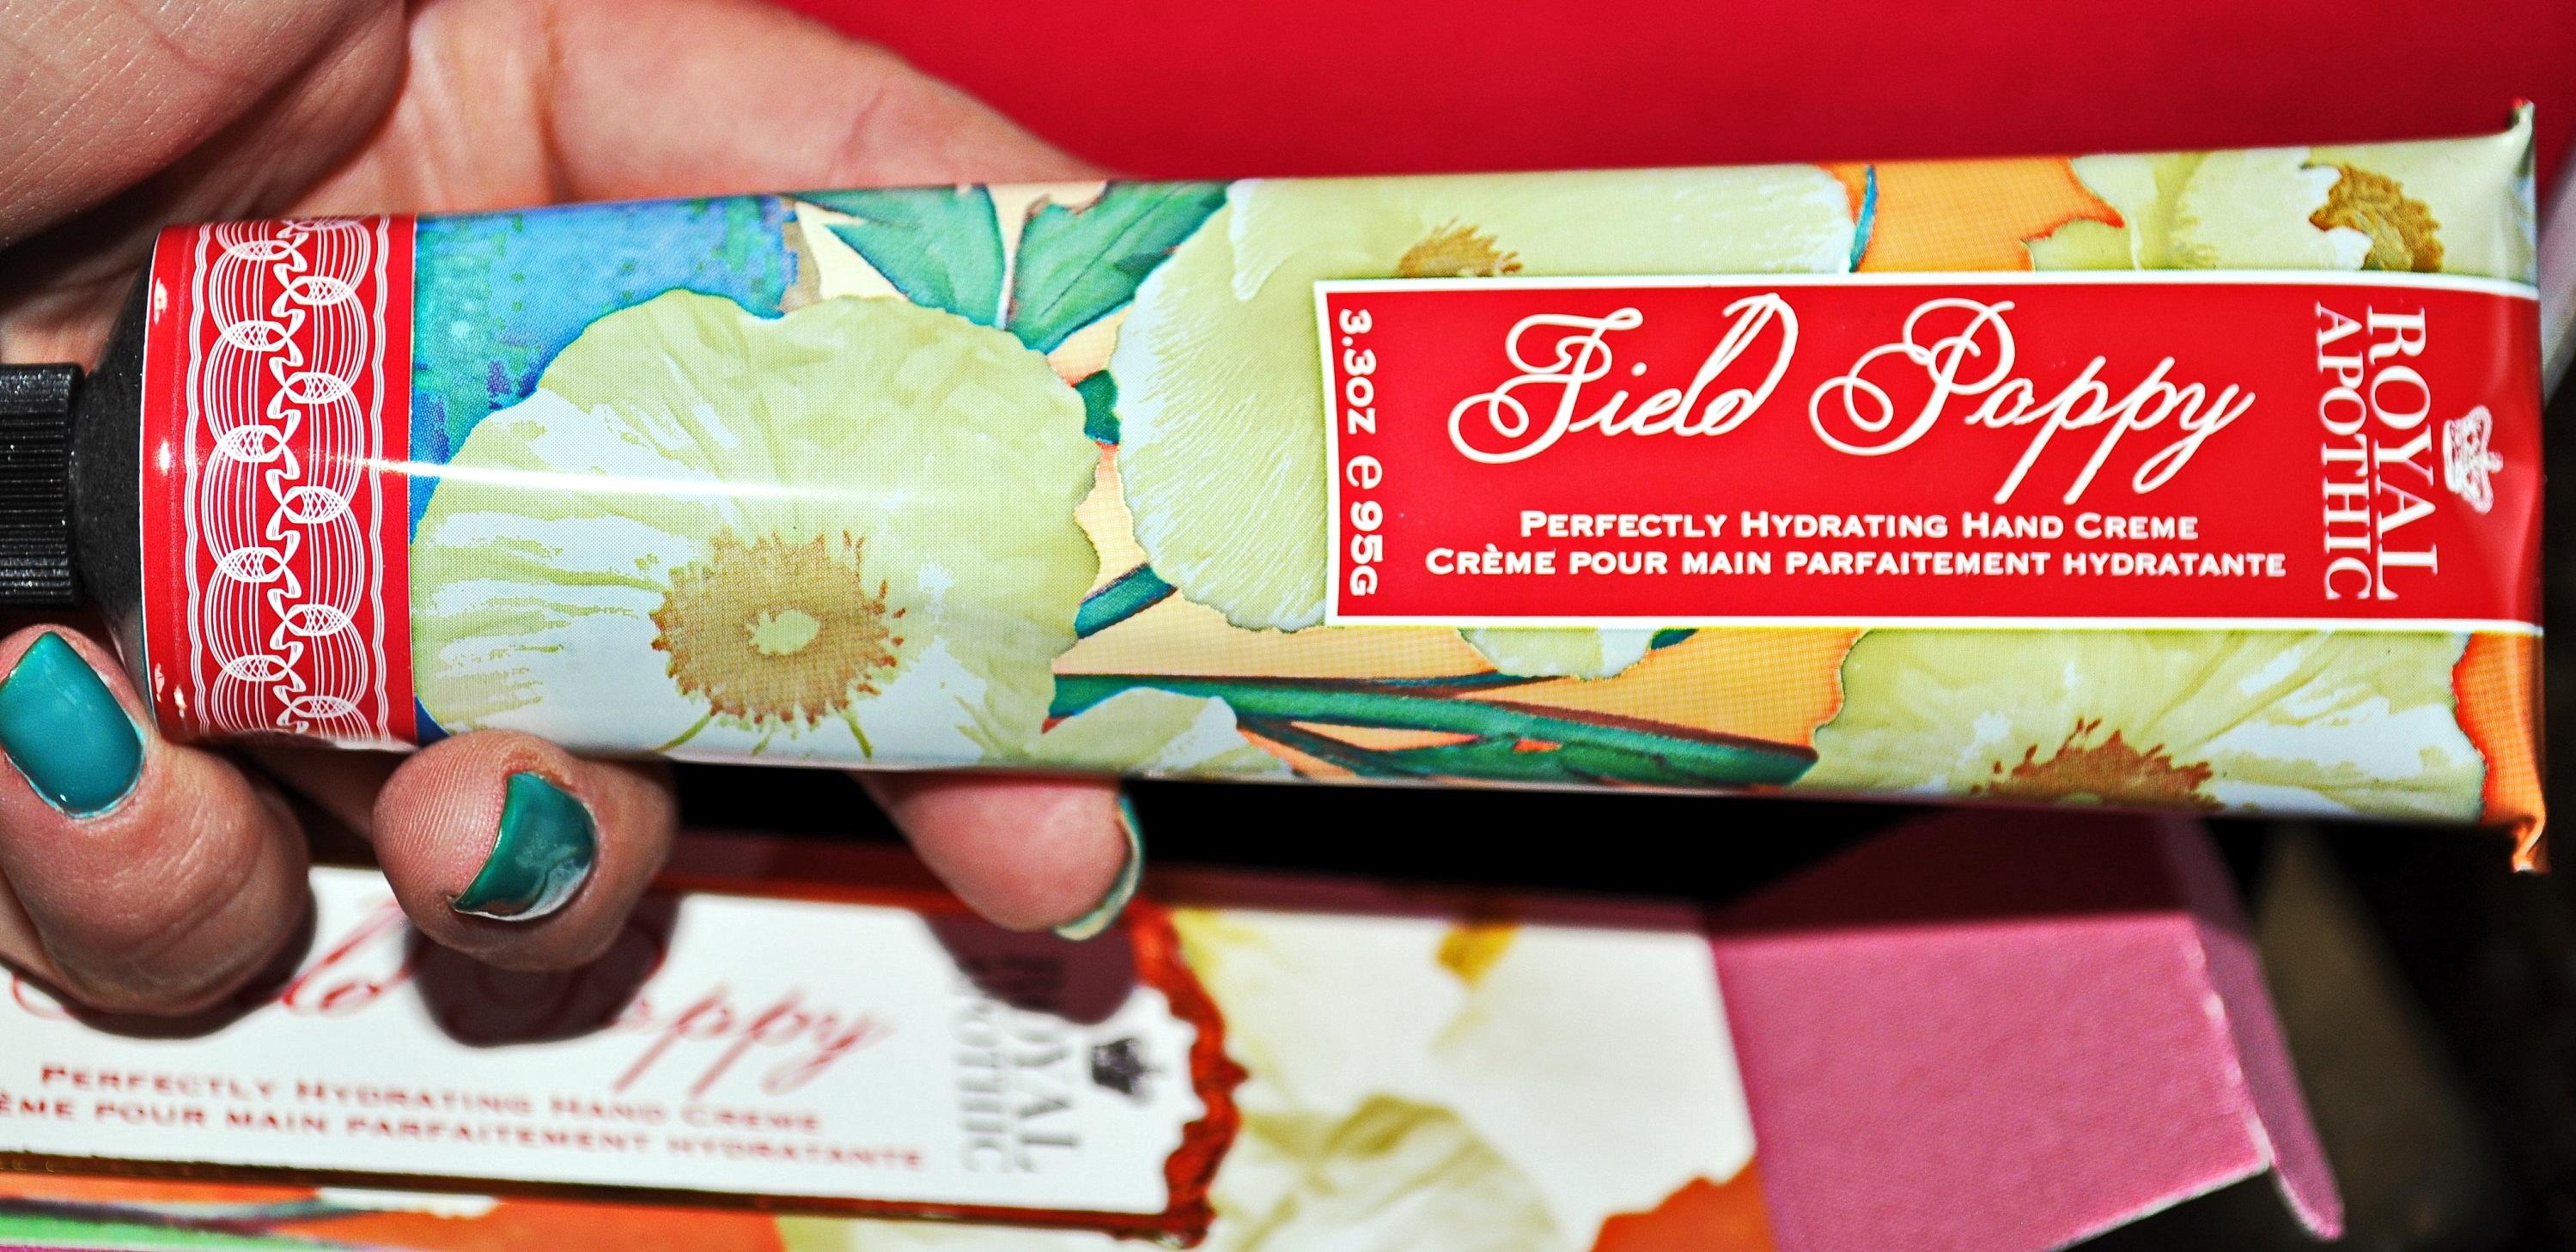 Popsugar Field Poppy Creme Tube